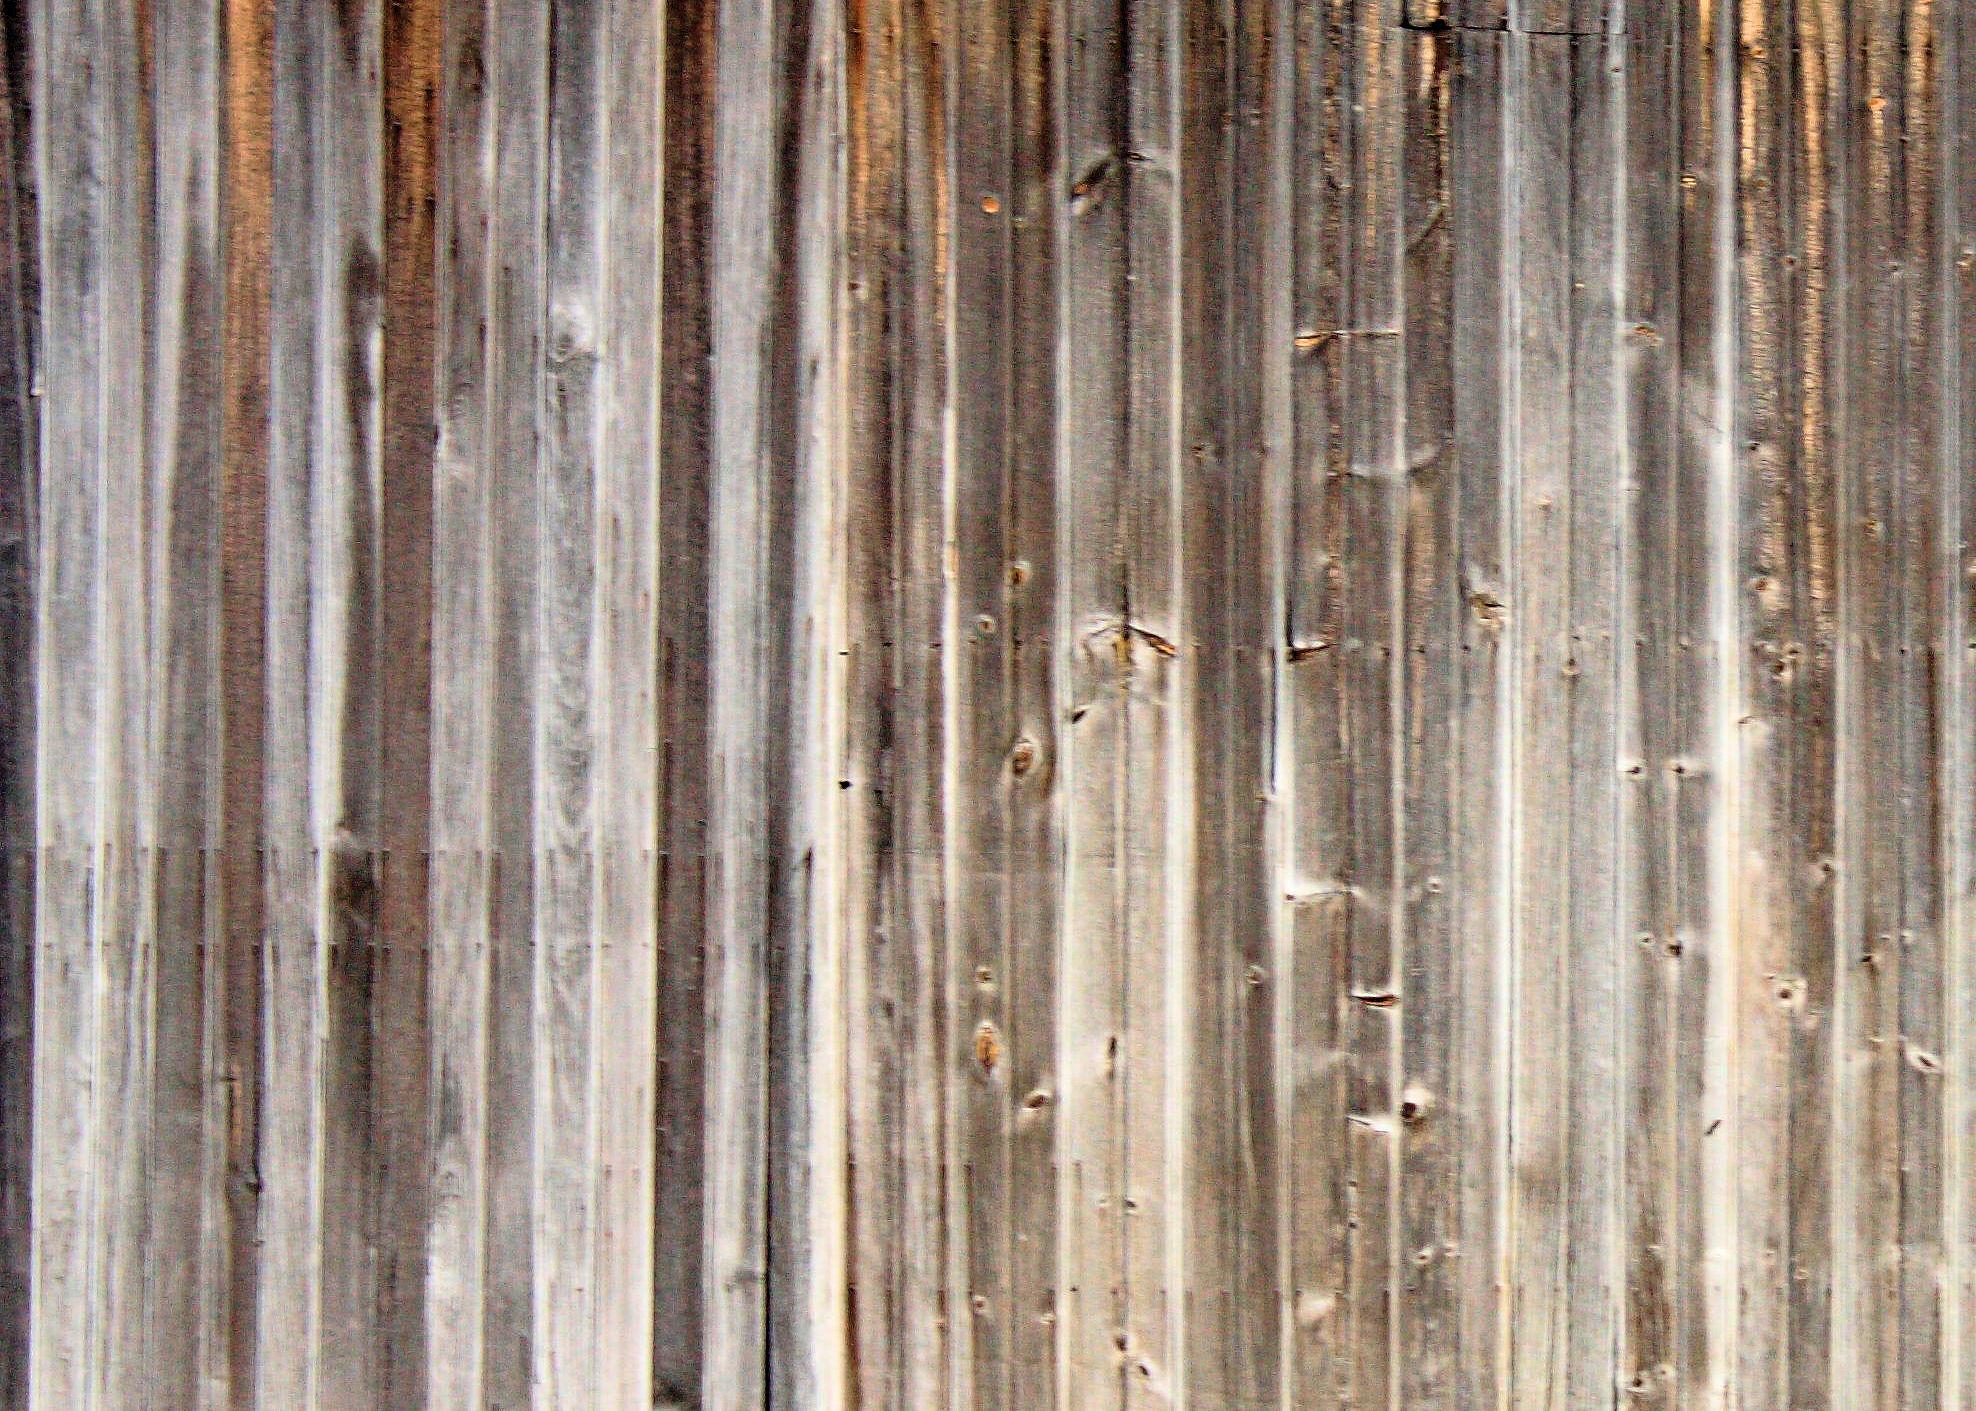 Barn Siding Wallpaper Wallpapersafari